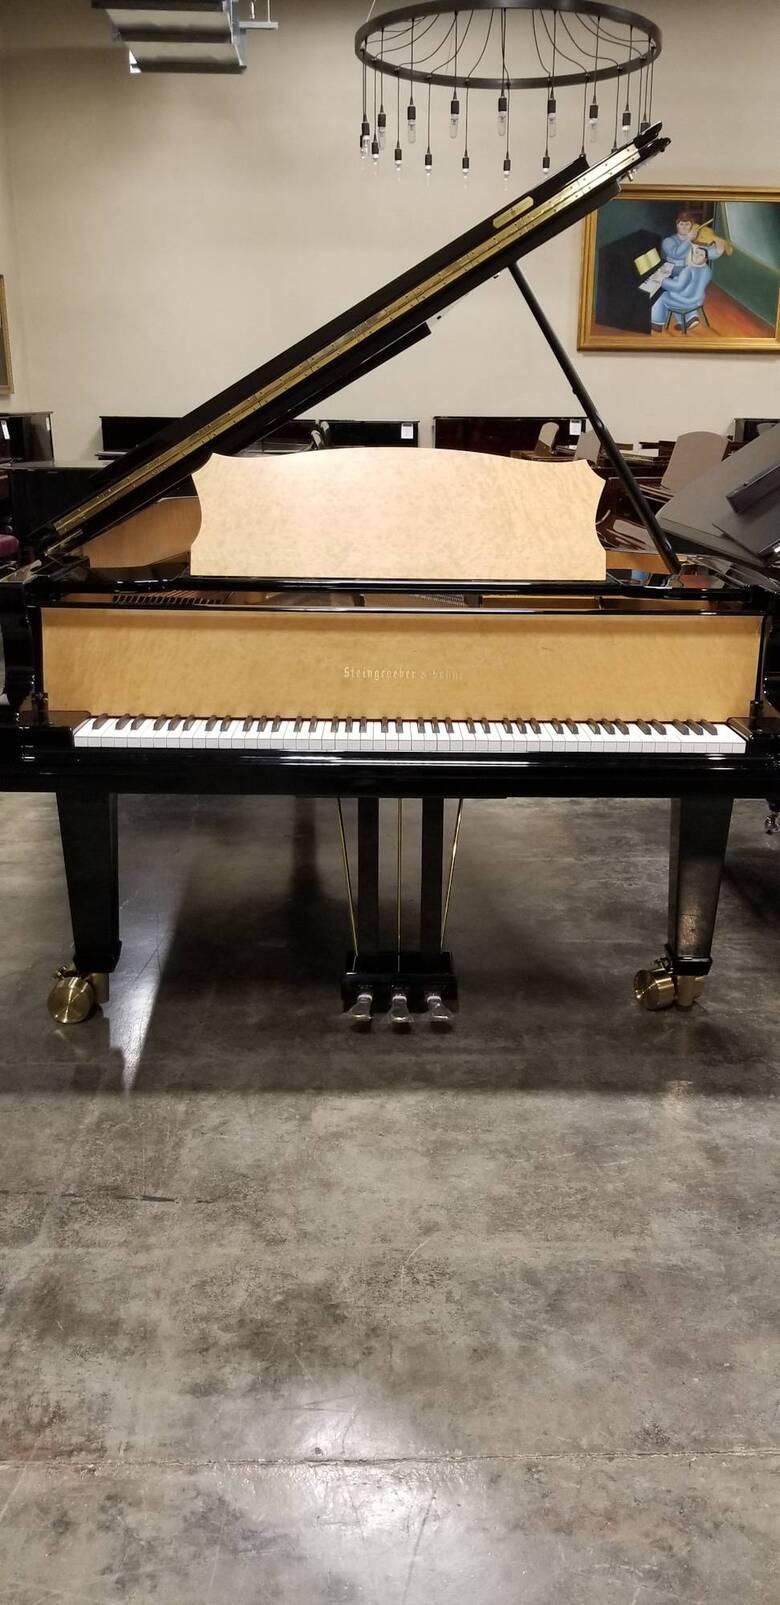 Steingraeber | 2008 | E-272 9 FT Concert Grand Piano| Custom